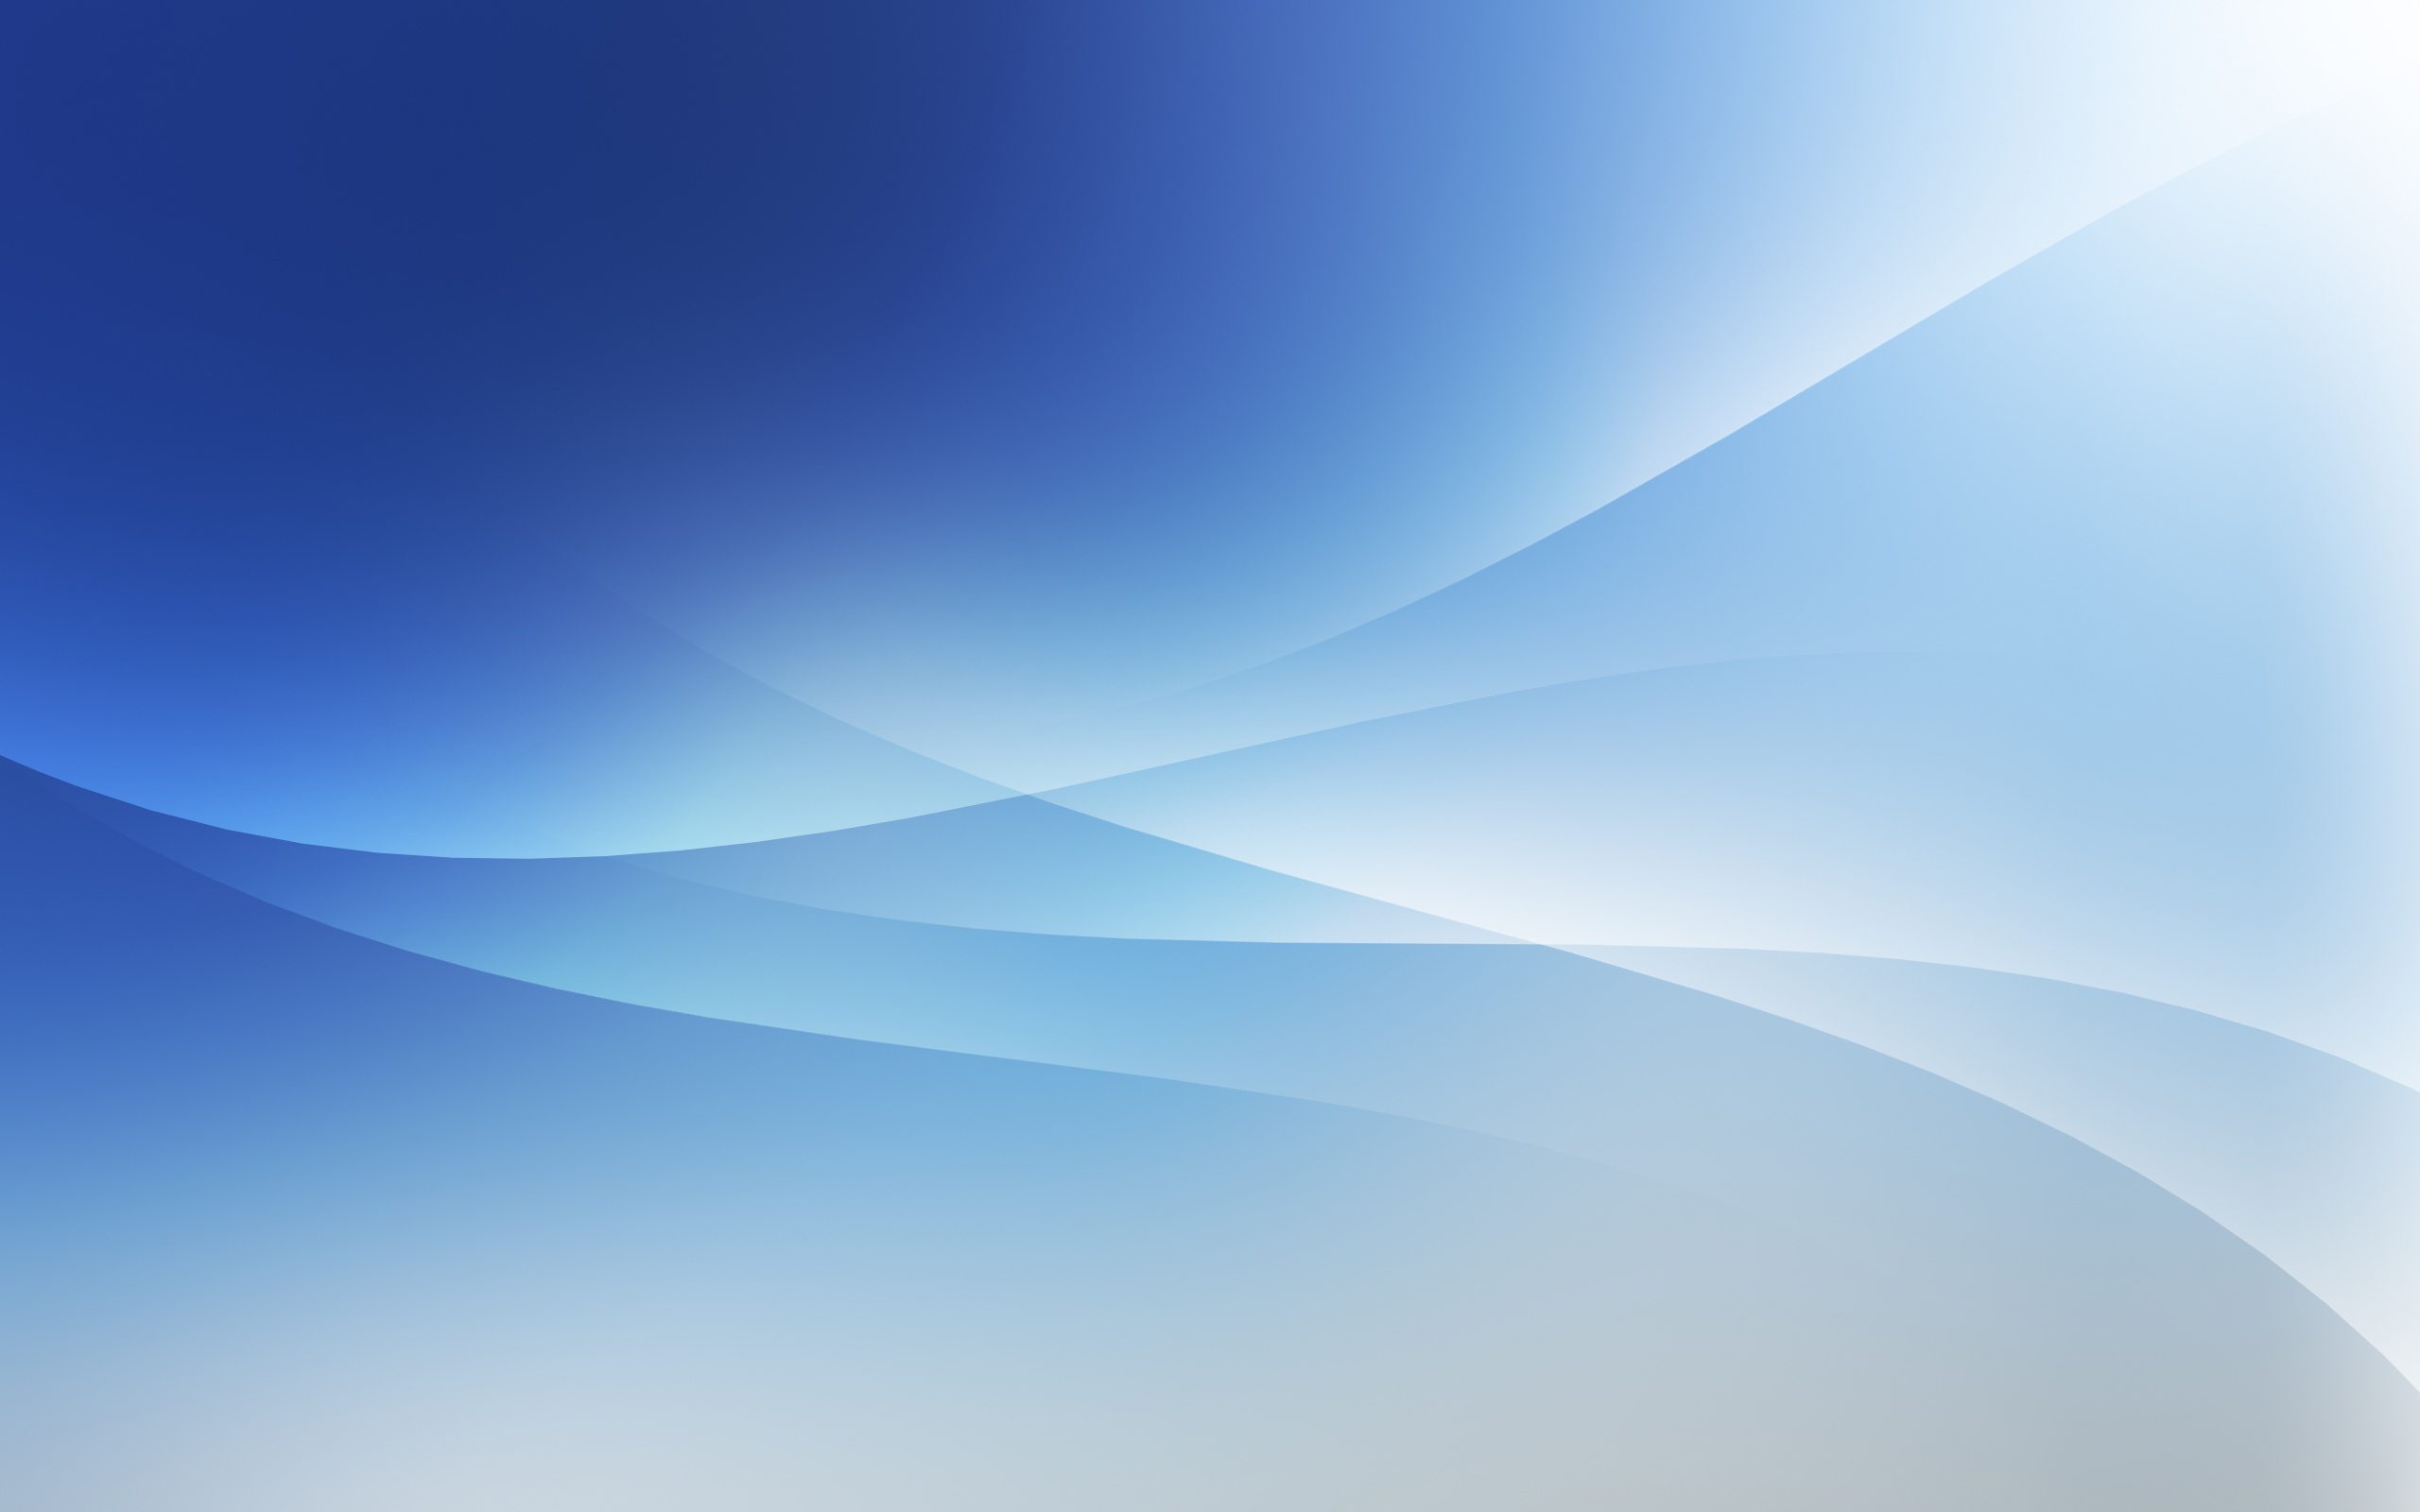 сухарях картинки фон для презентации голубой фон хуторе